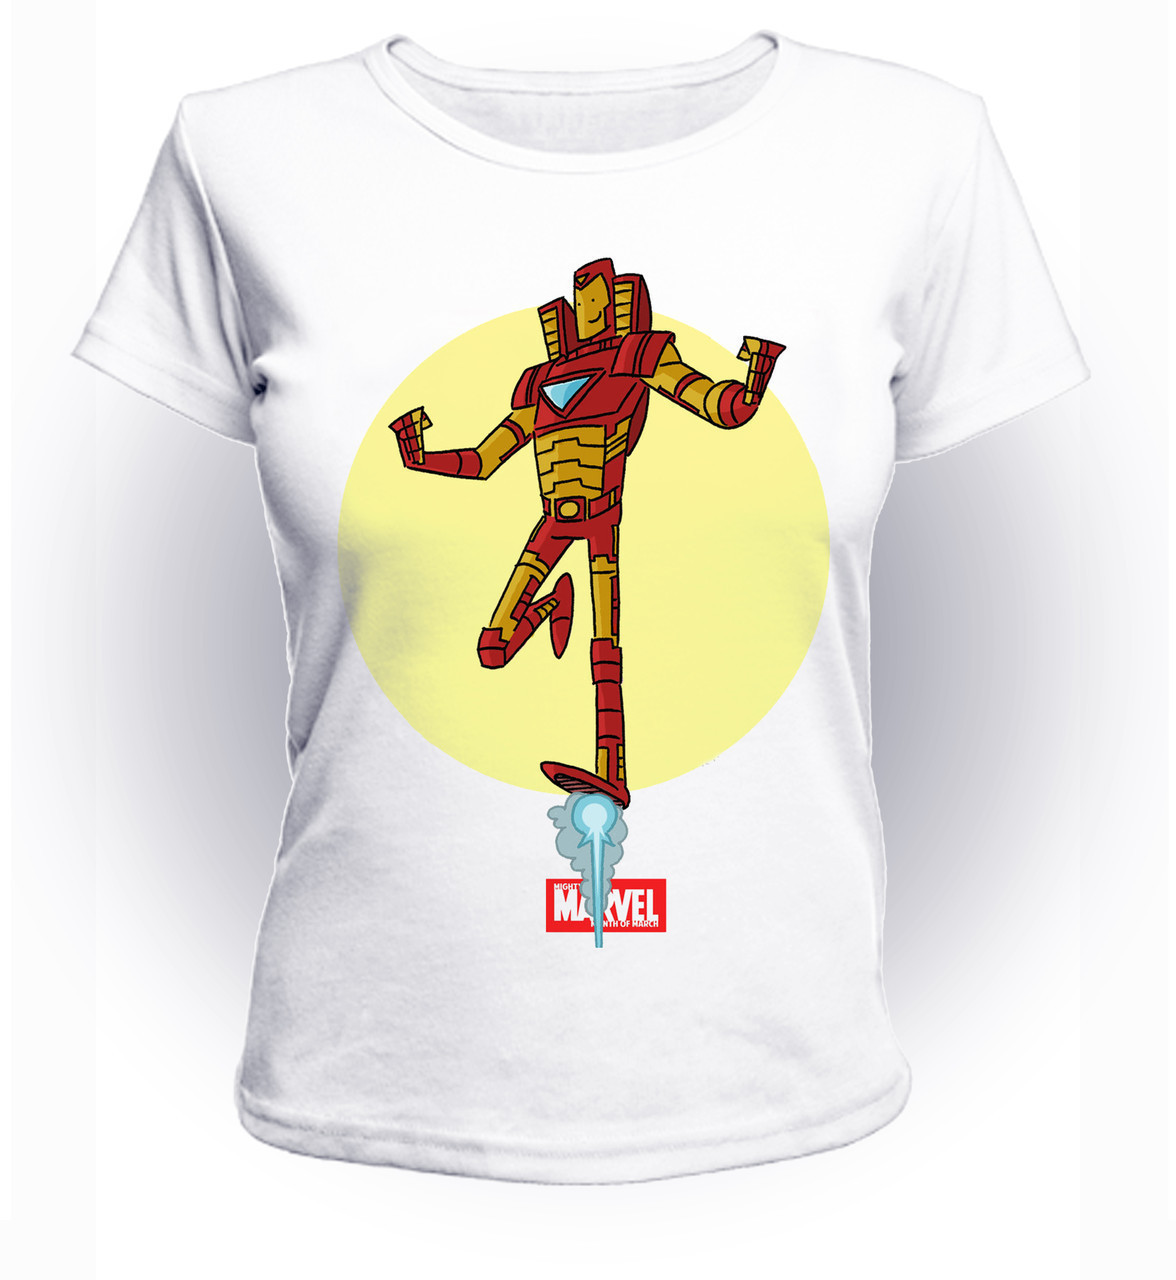 Футболка женская GeekLand Железный Человек Iron Man sun art IM.01.033